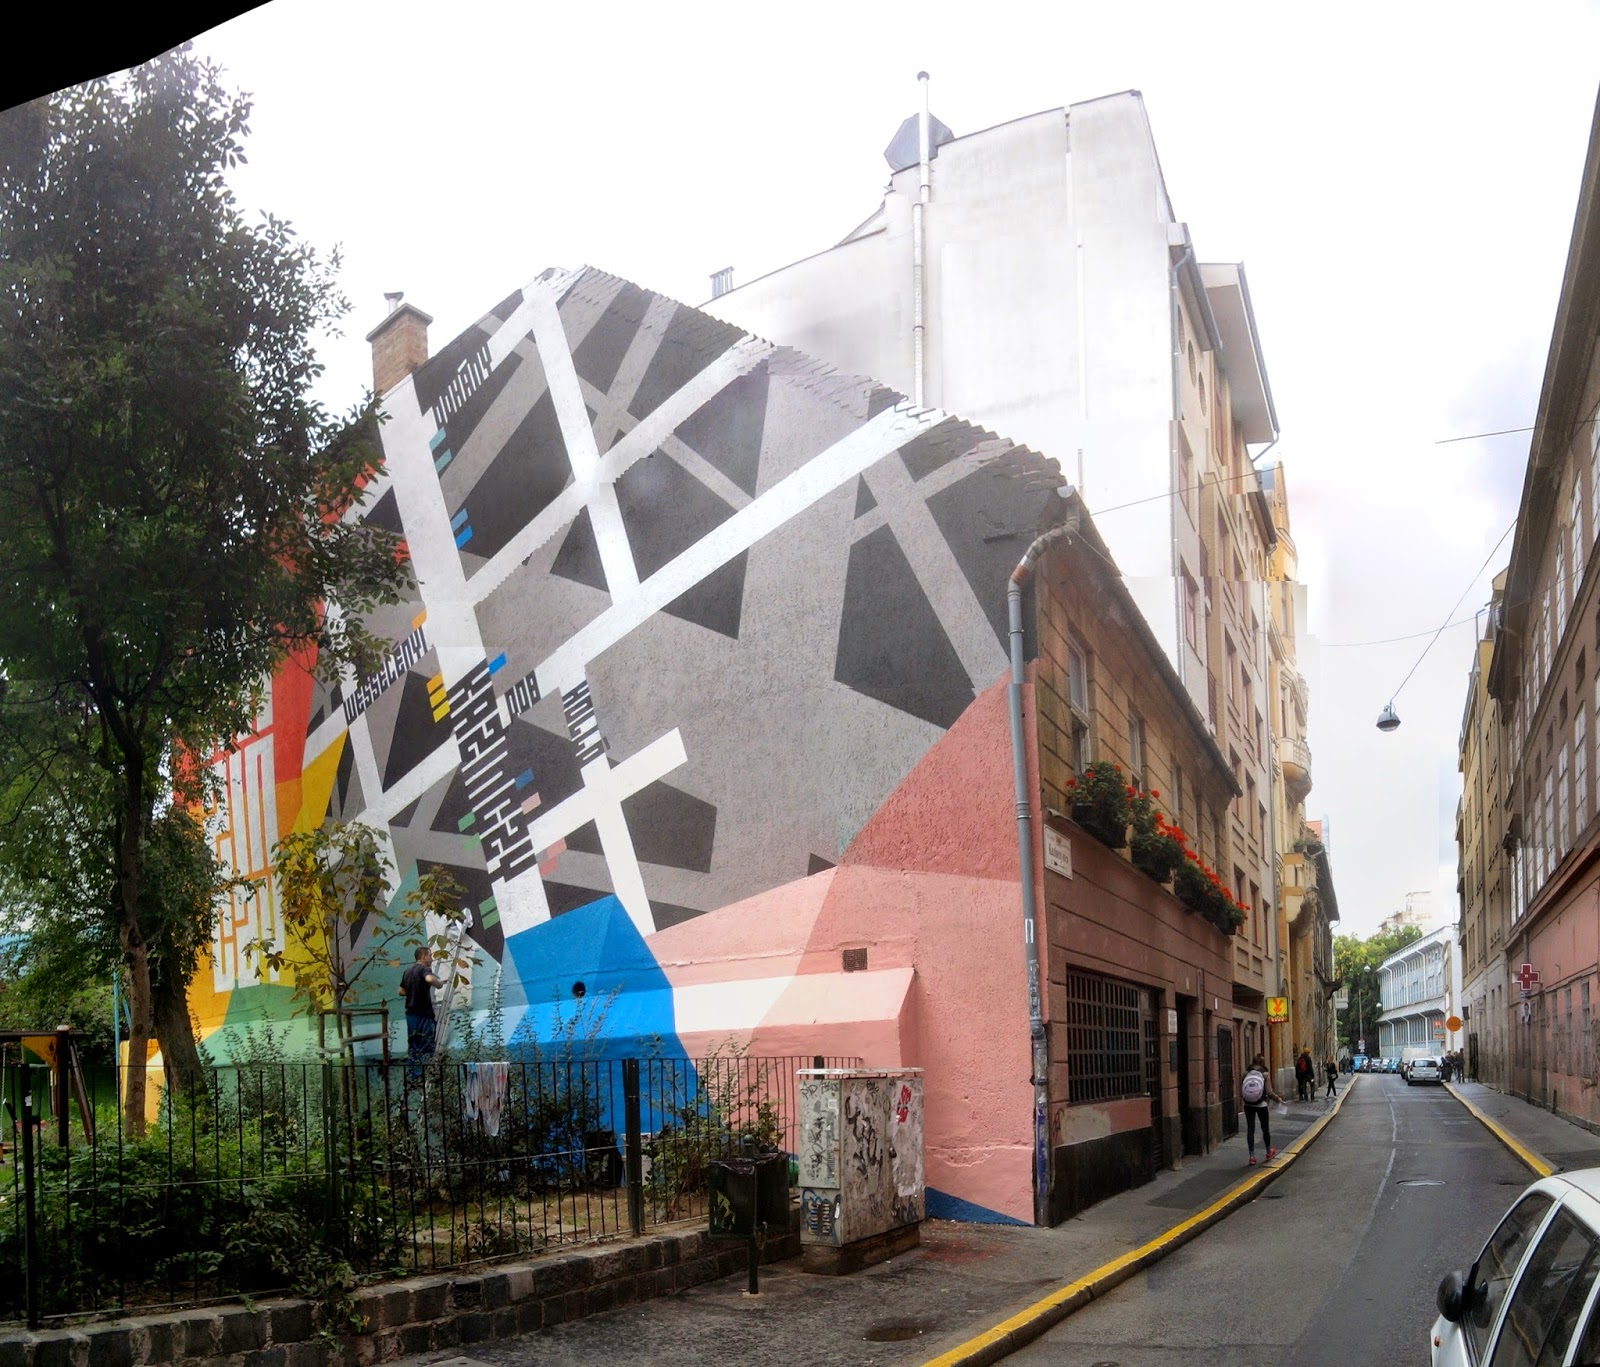 Kazinczy utca, Wichmann Tamás, graffiti, Wichmann Kocsma, VII. kerület, térkép, Király utca, Wichmann kocsmája, urban art